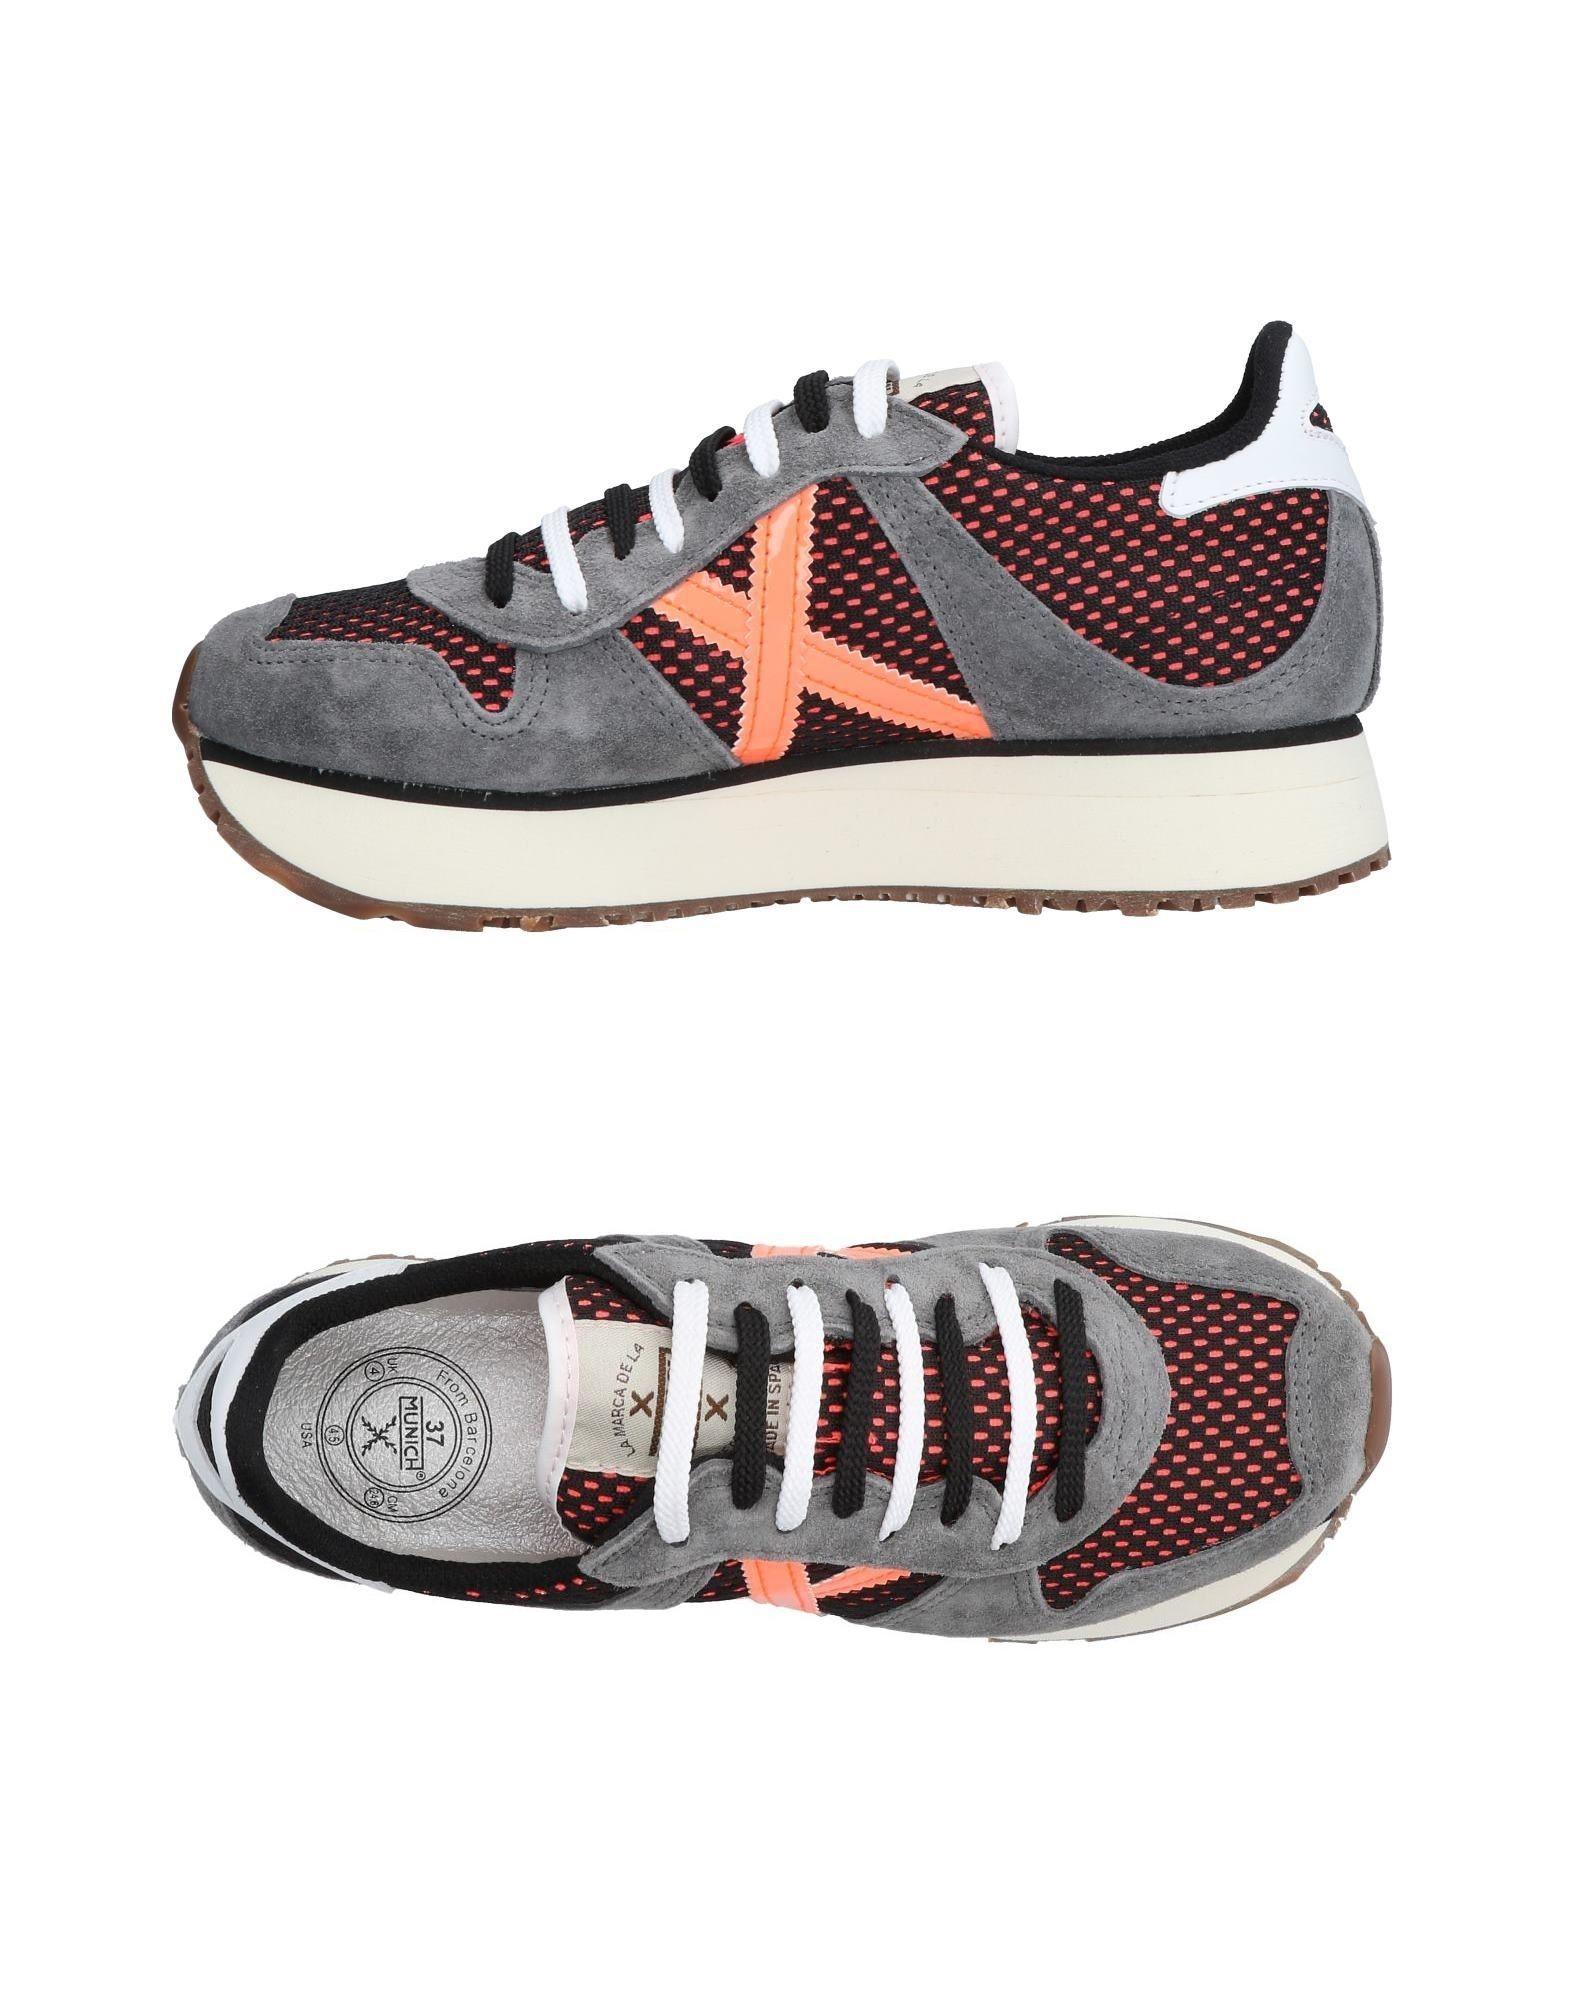 Moda Sneakers Munich Donna - 11446355GB